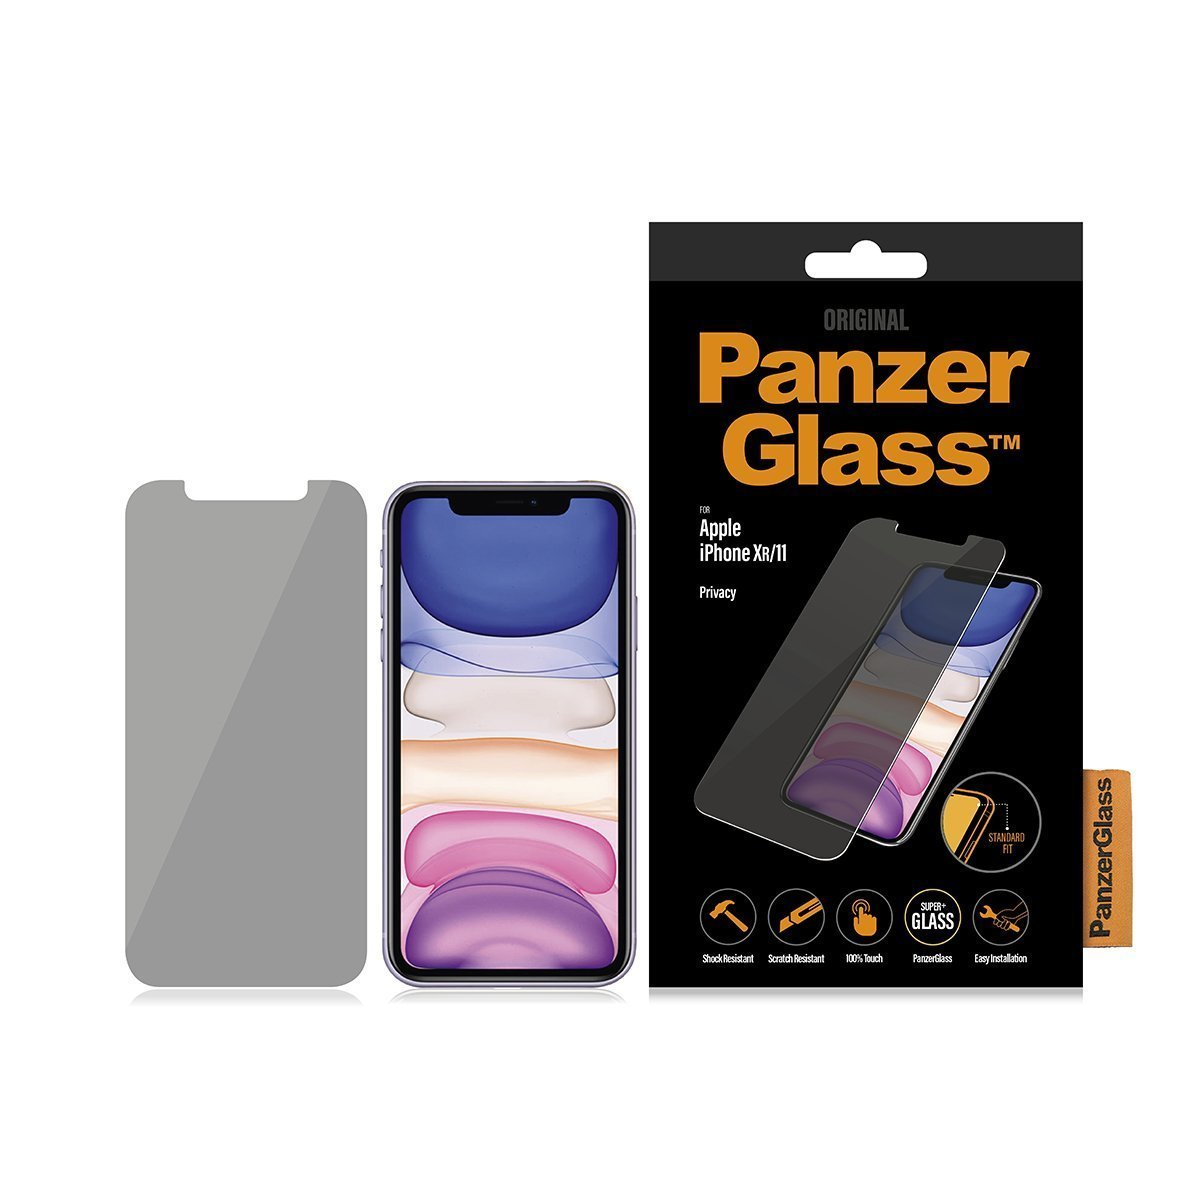 PanzerGlass P2662 protector de pantalla Protector de pantalla anti-reflejante Teléfono móvil/smartphone Apple 1 pieza(s)